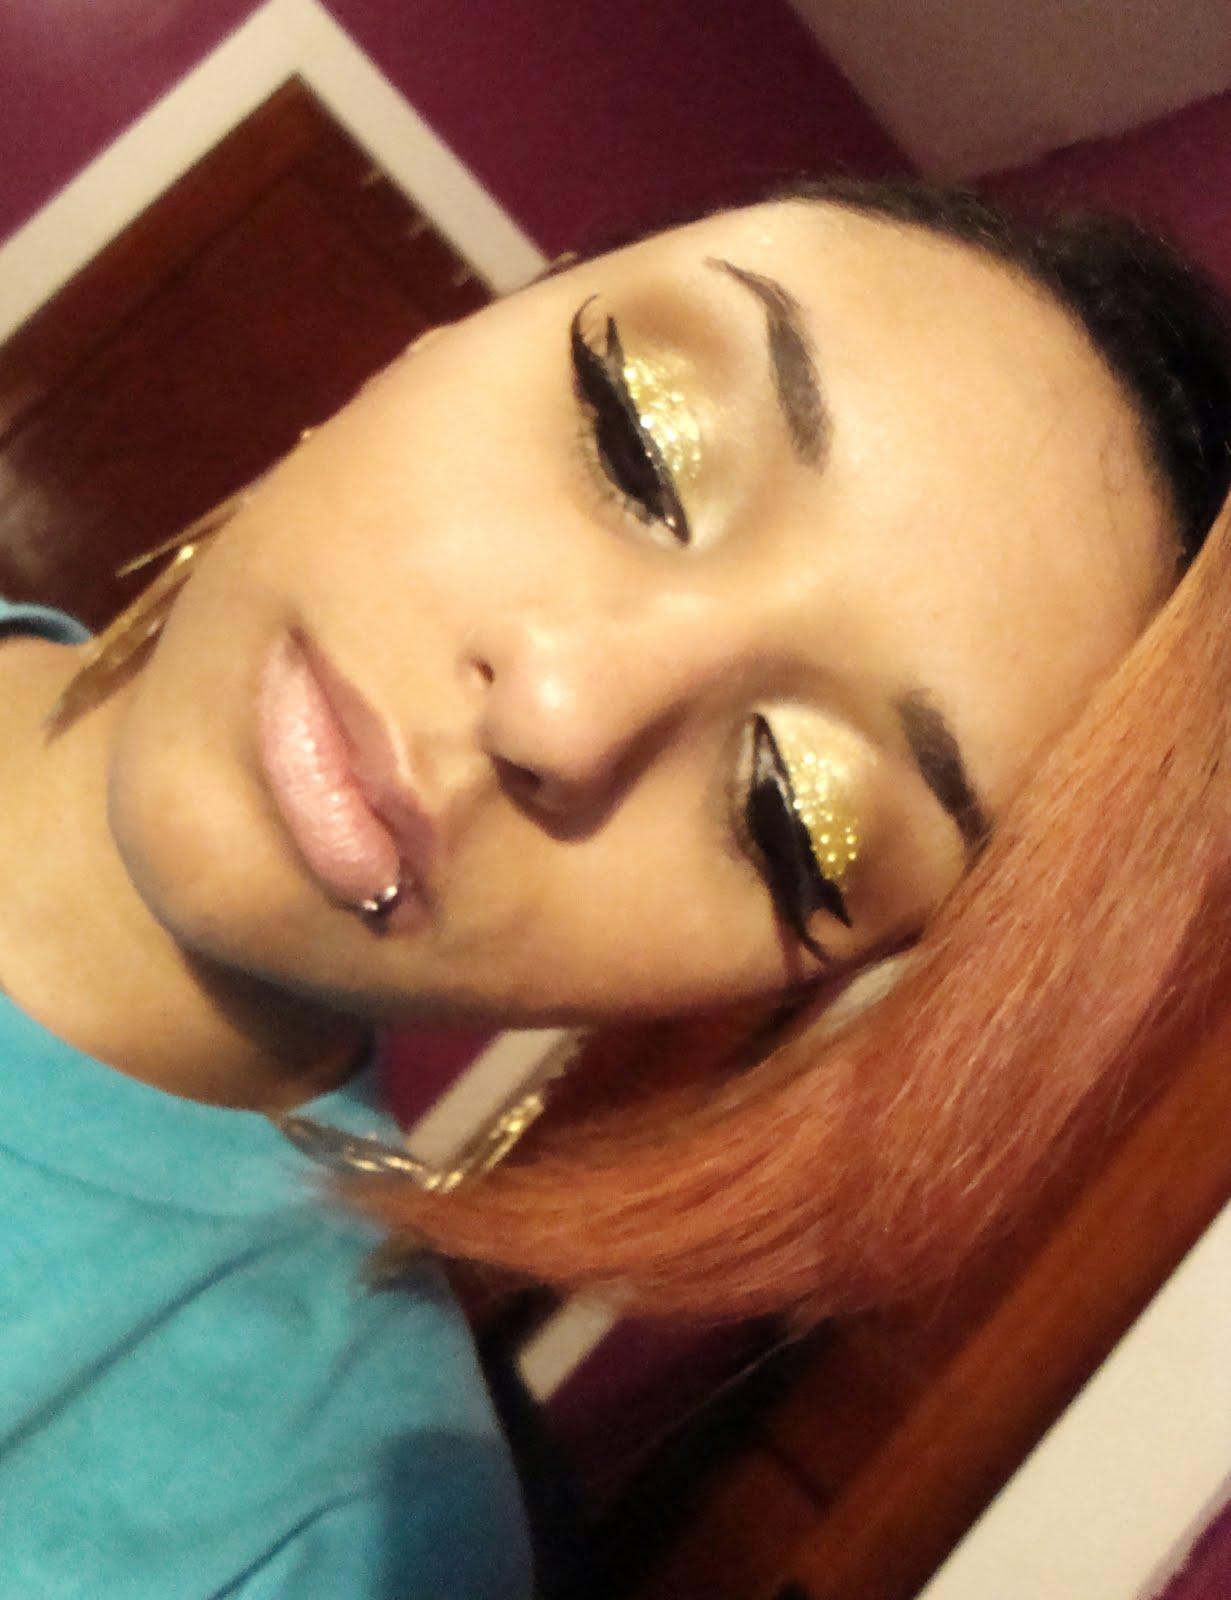 eyeshadow in